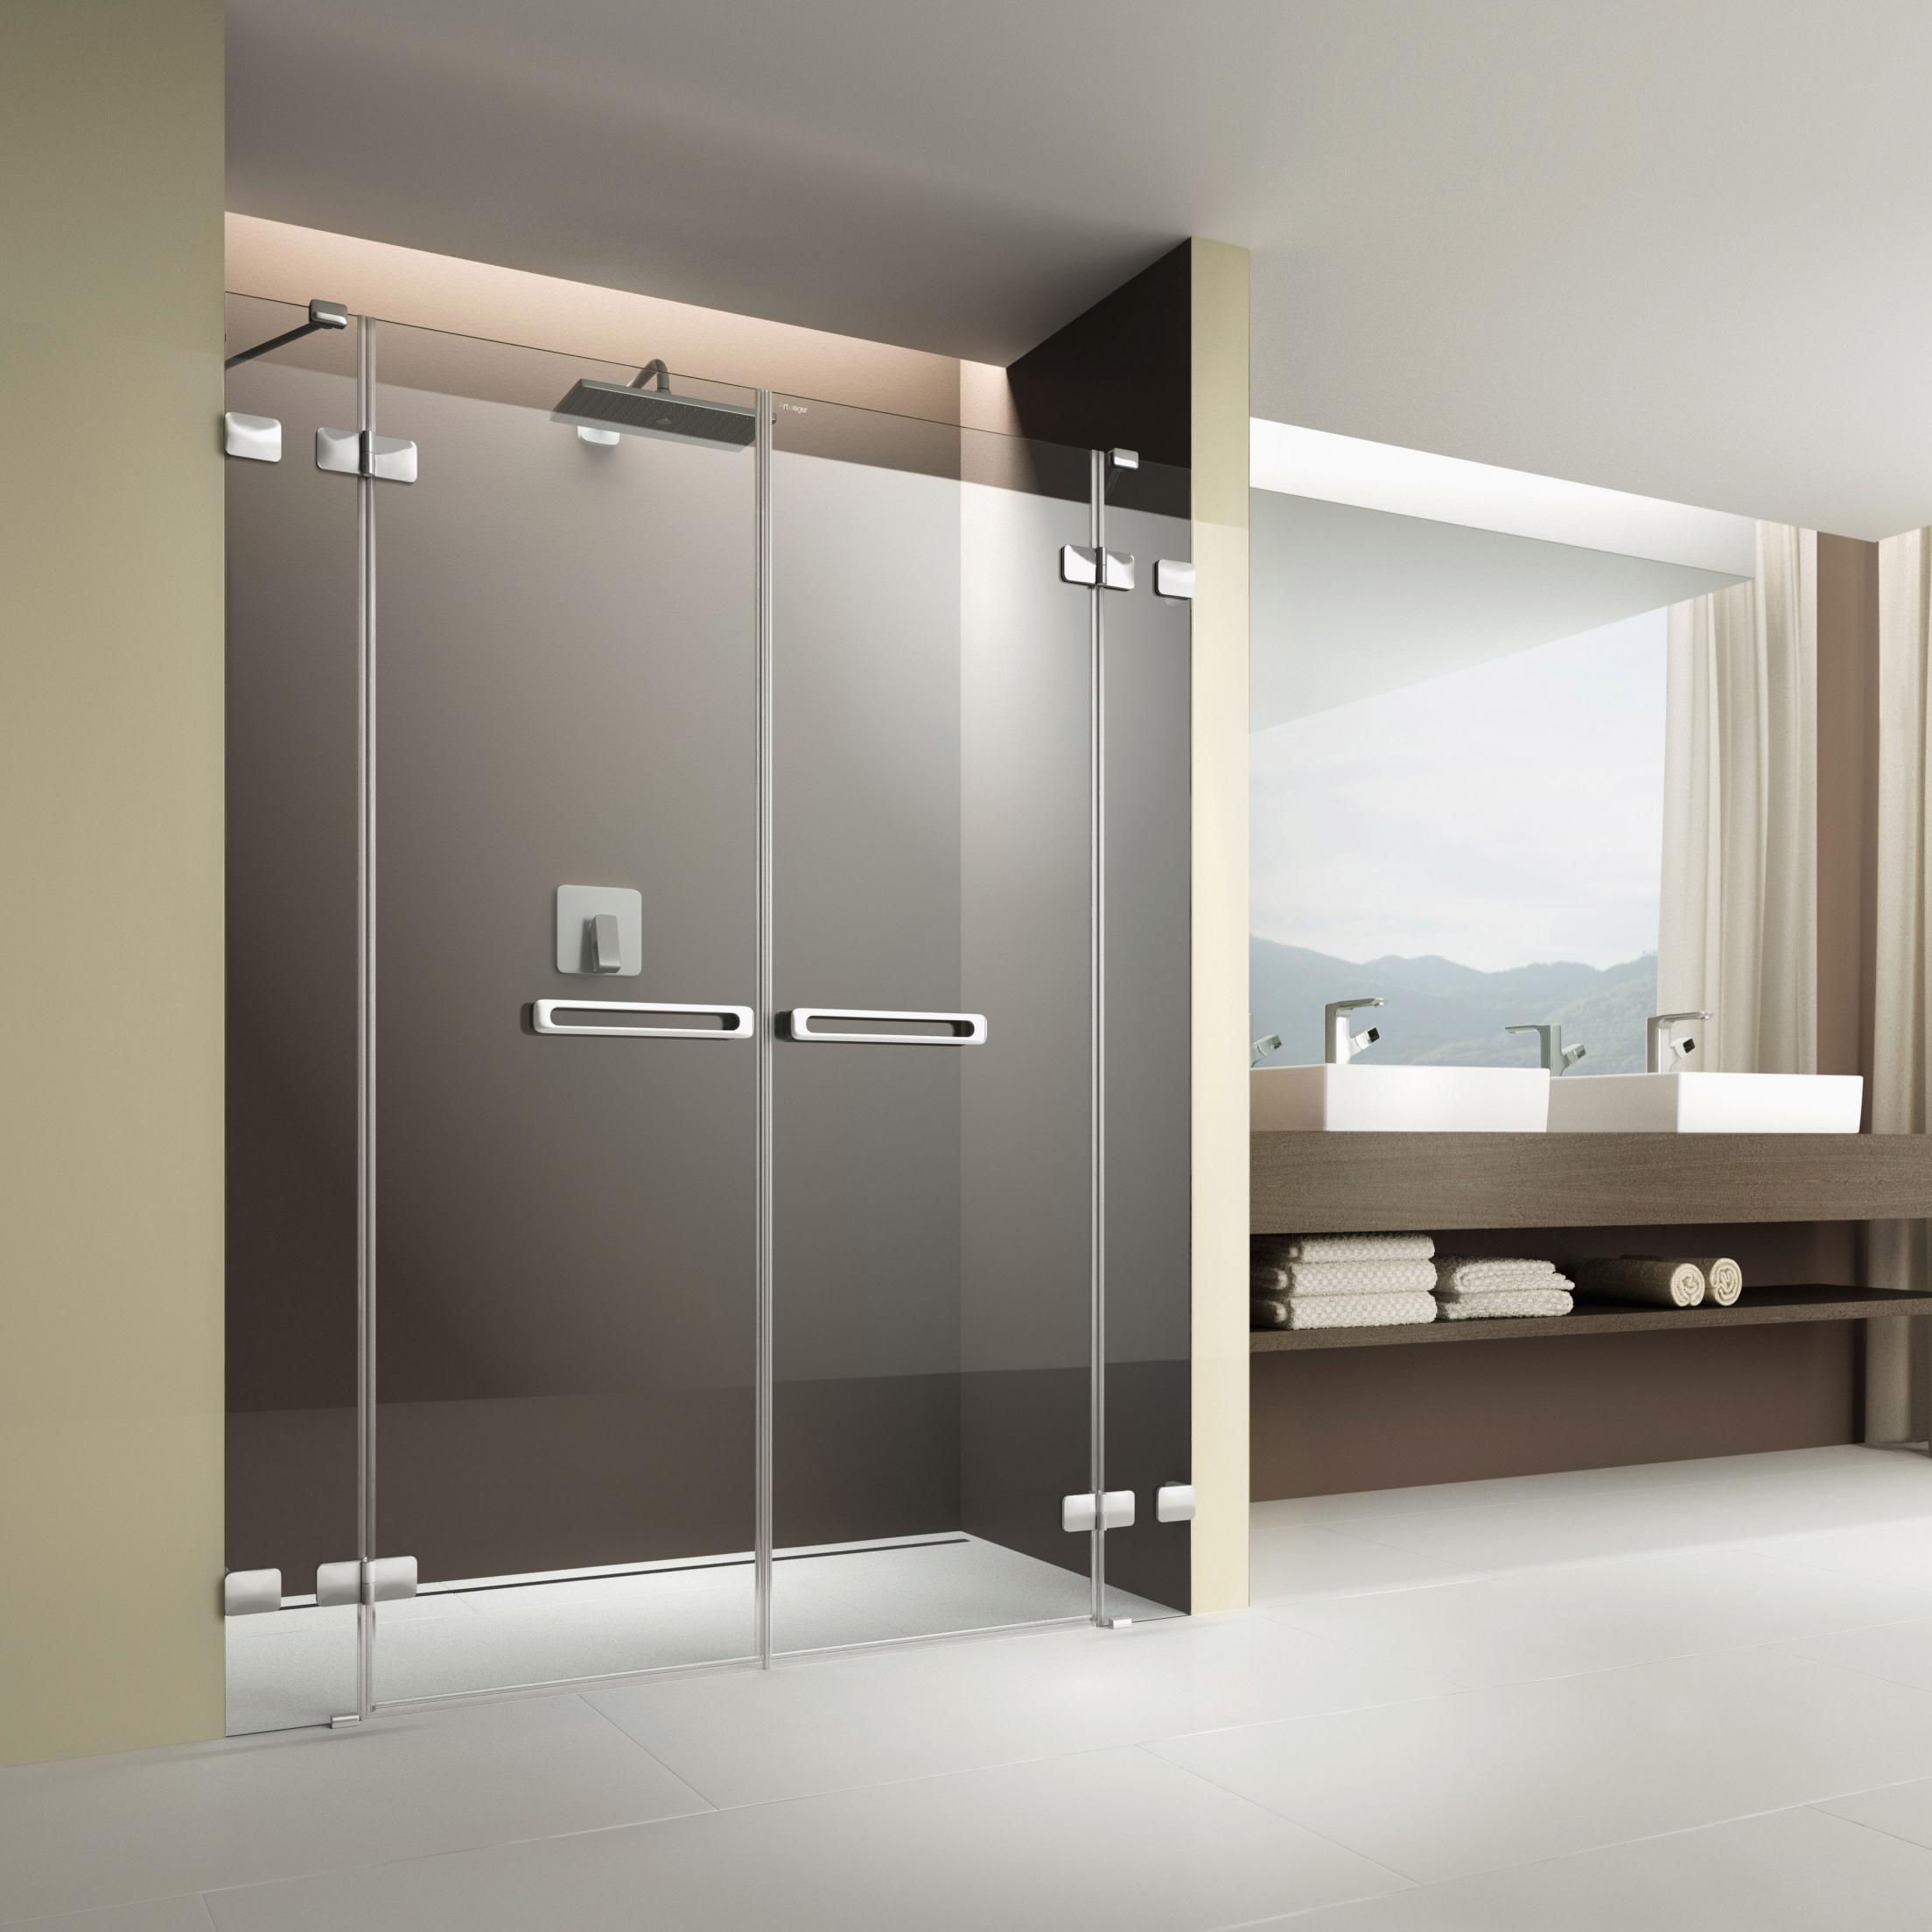 artweger 360 - special mention bath